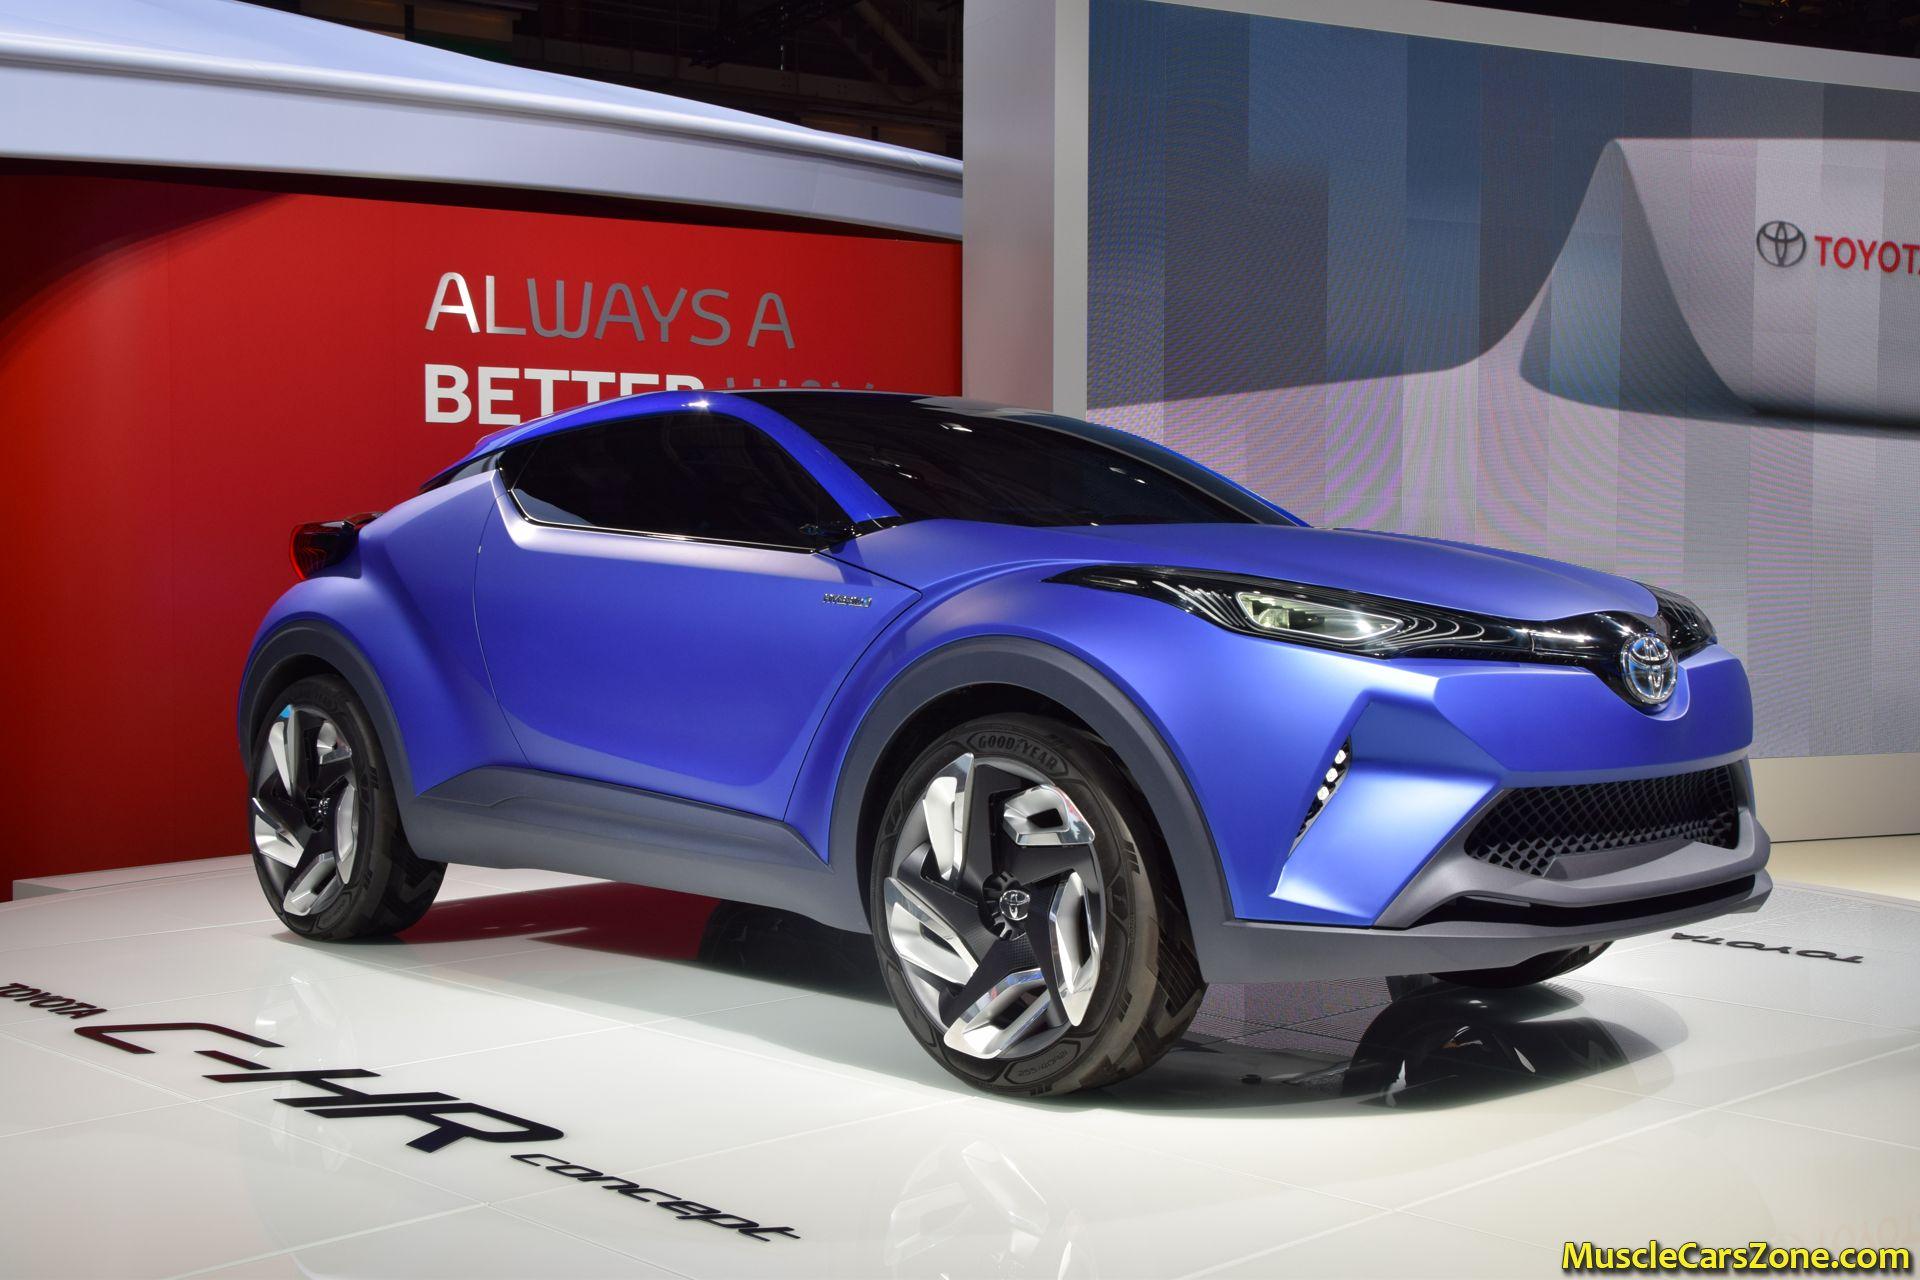 Toyota C-HR Concept 2014 Paris Motor Show 8 - Muscle Cars Zone!